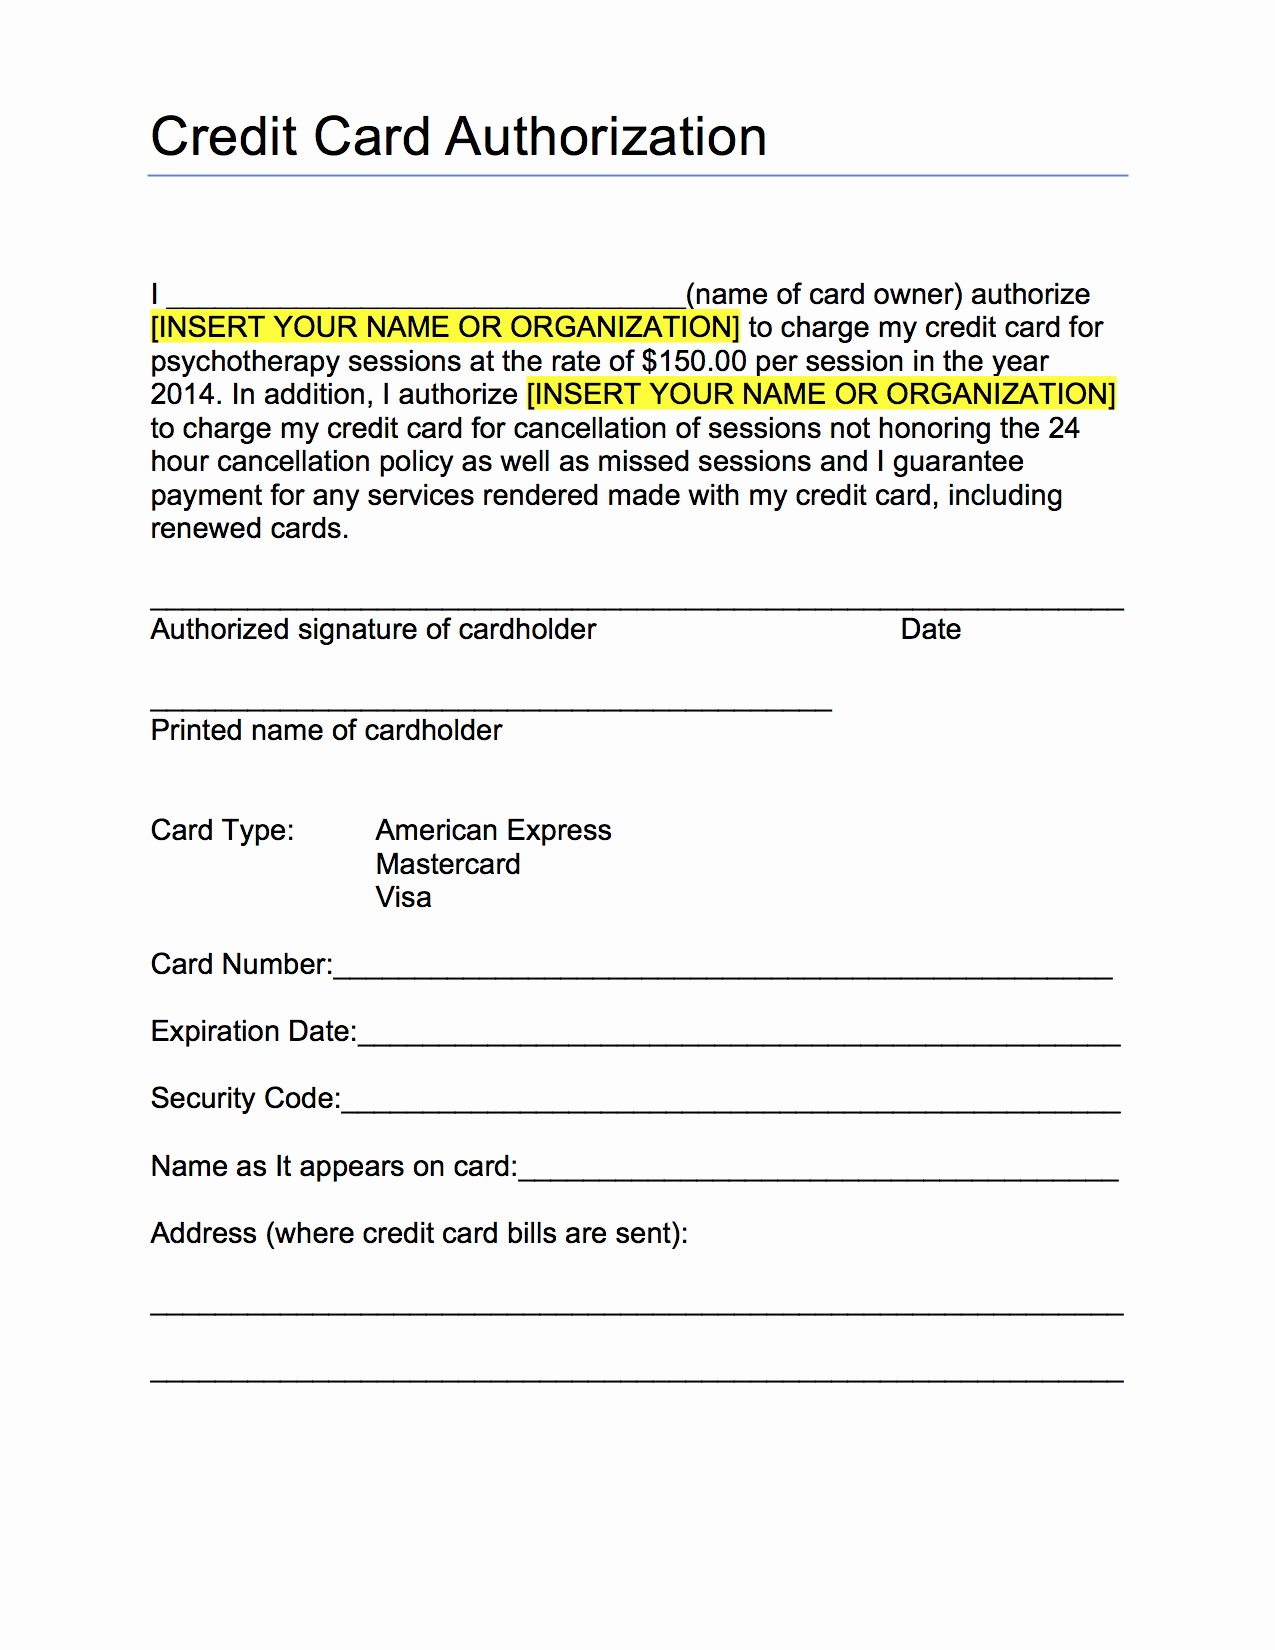 Credit Card form Template Unique Credit Card Authorization form Template Pdf Pdf Mughals